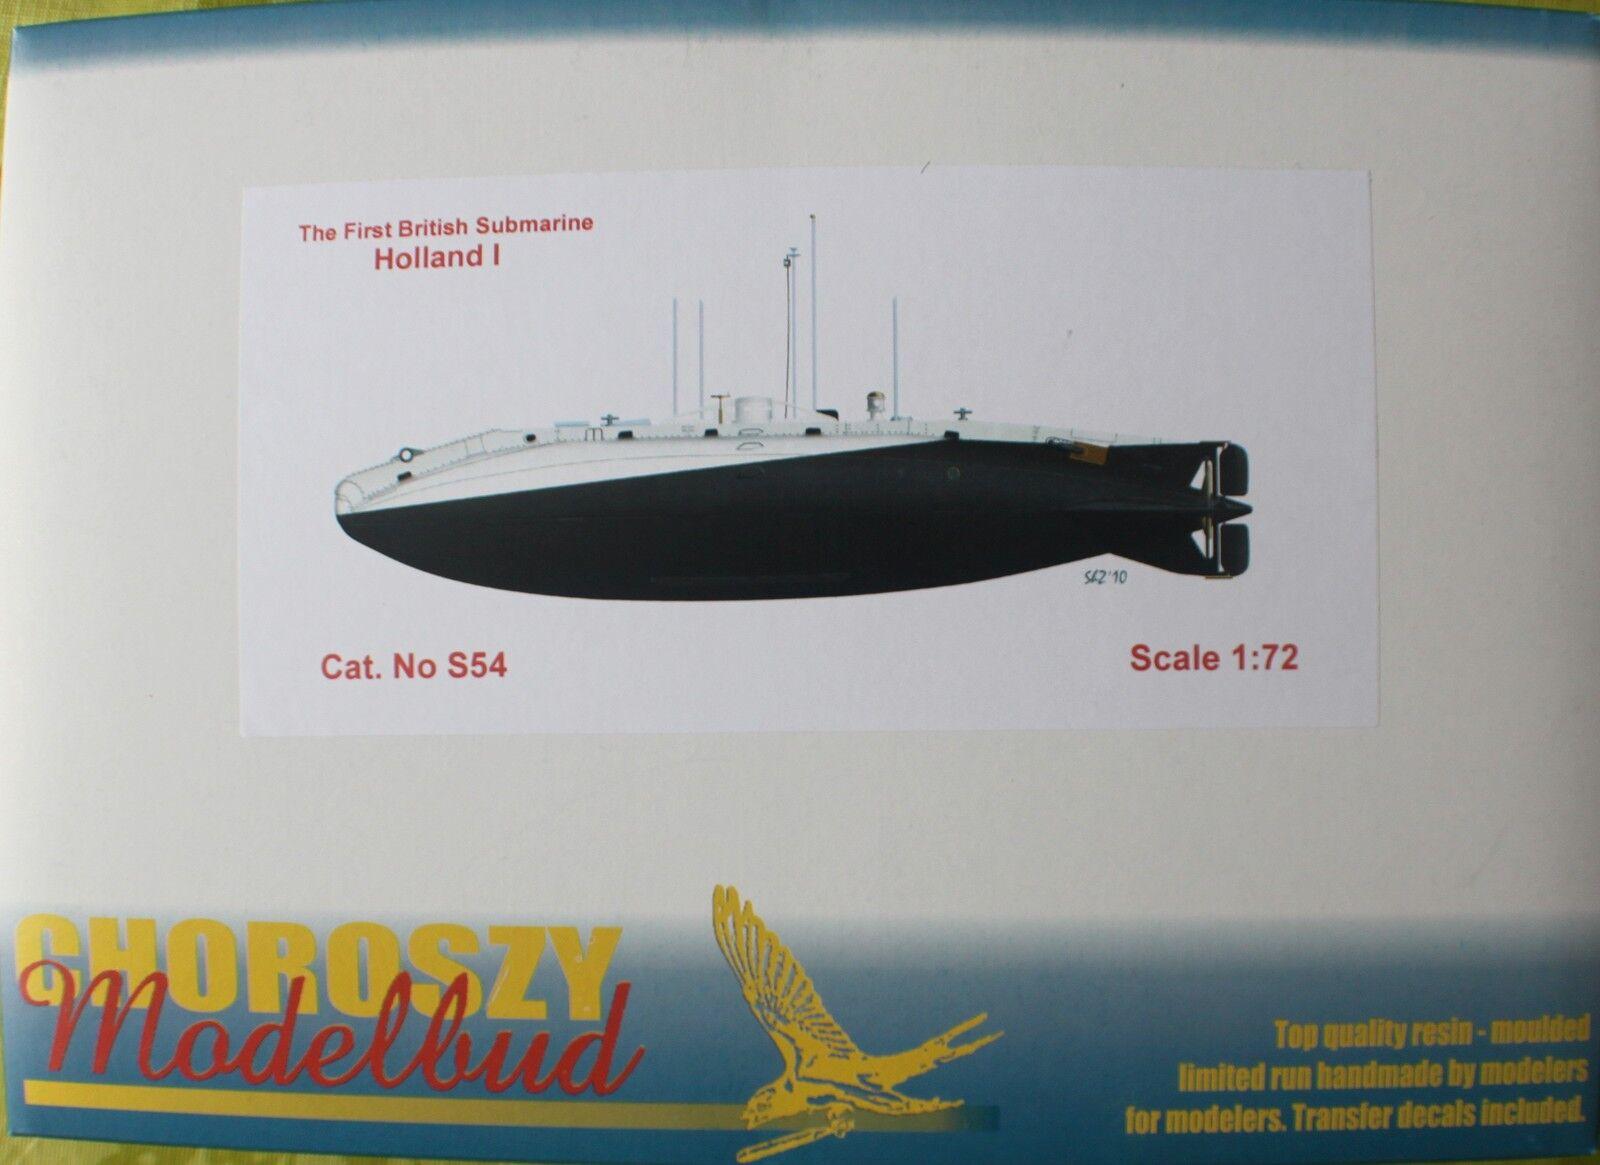 S54-The First British Submarine HOLLAND I-Chgoldszy-1 72